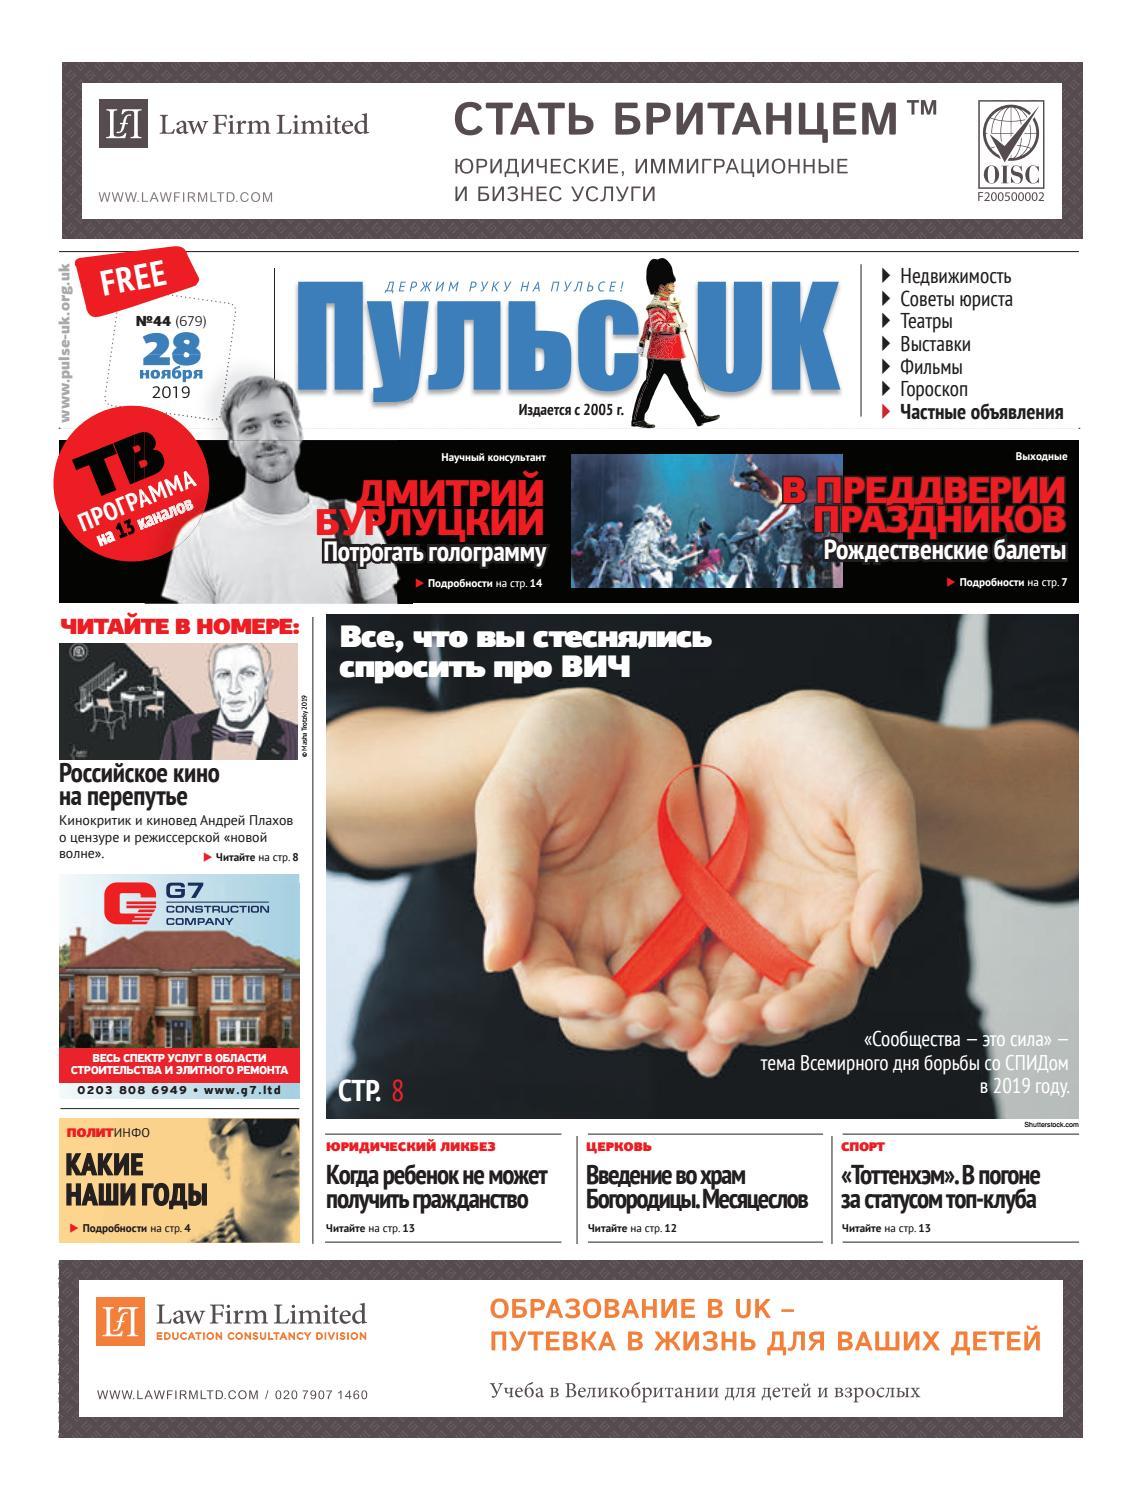 Pulse UK, N 44 (679). 28 ноября 2019 by Pulse UK newspaper